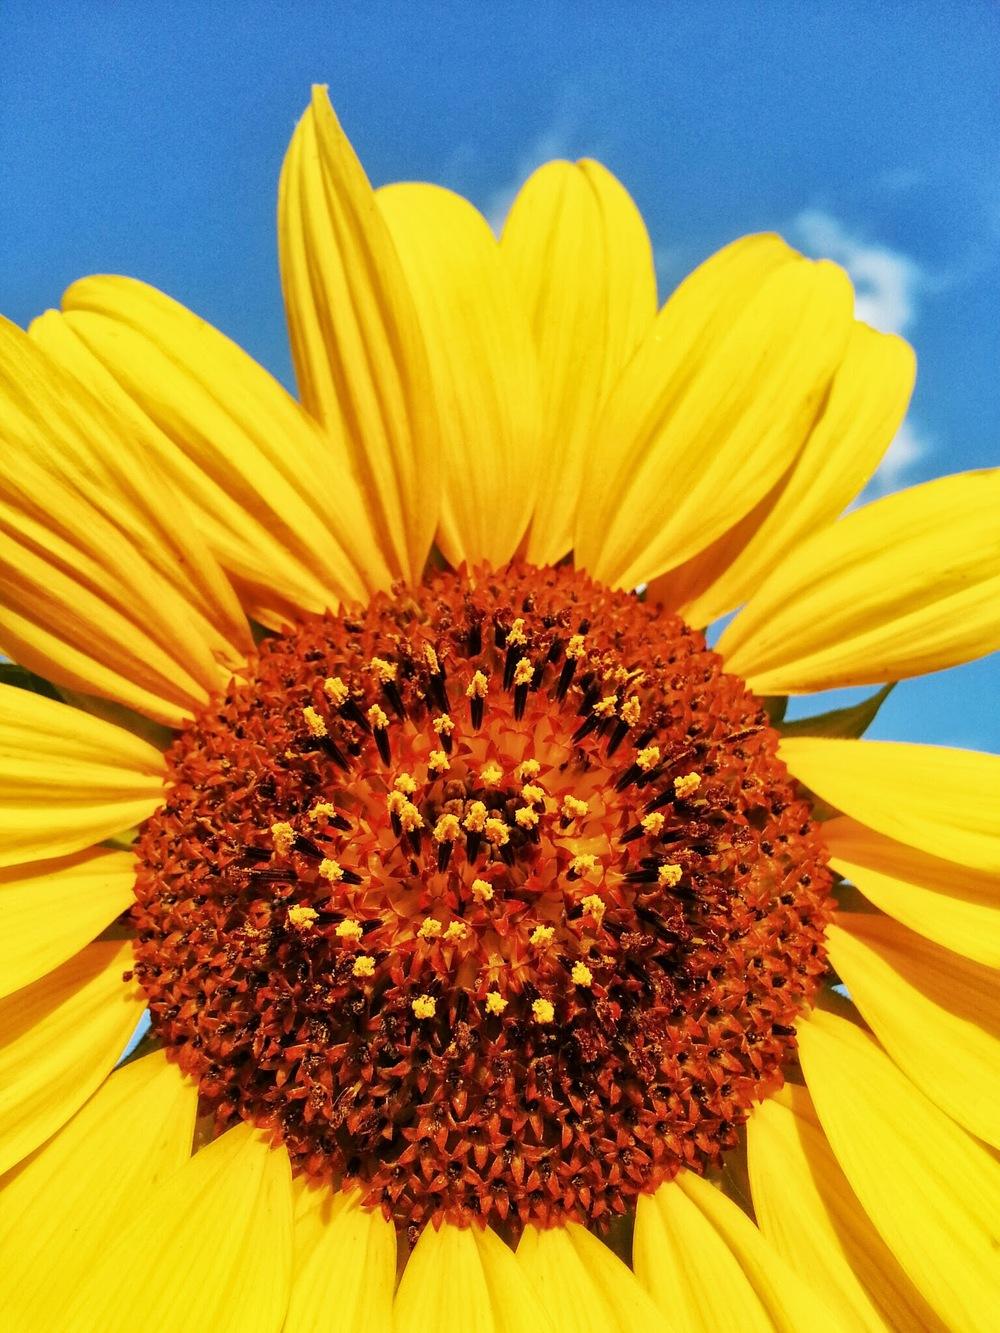 Sunny Sunday Sunflower